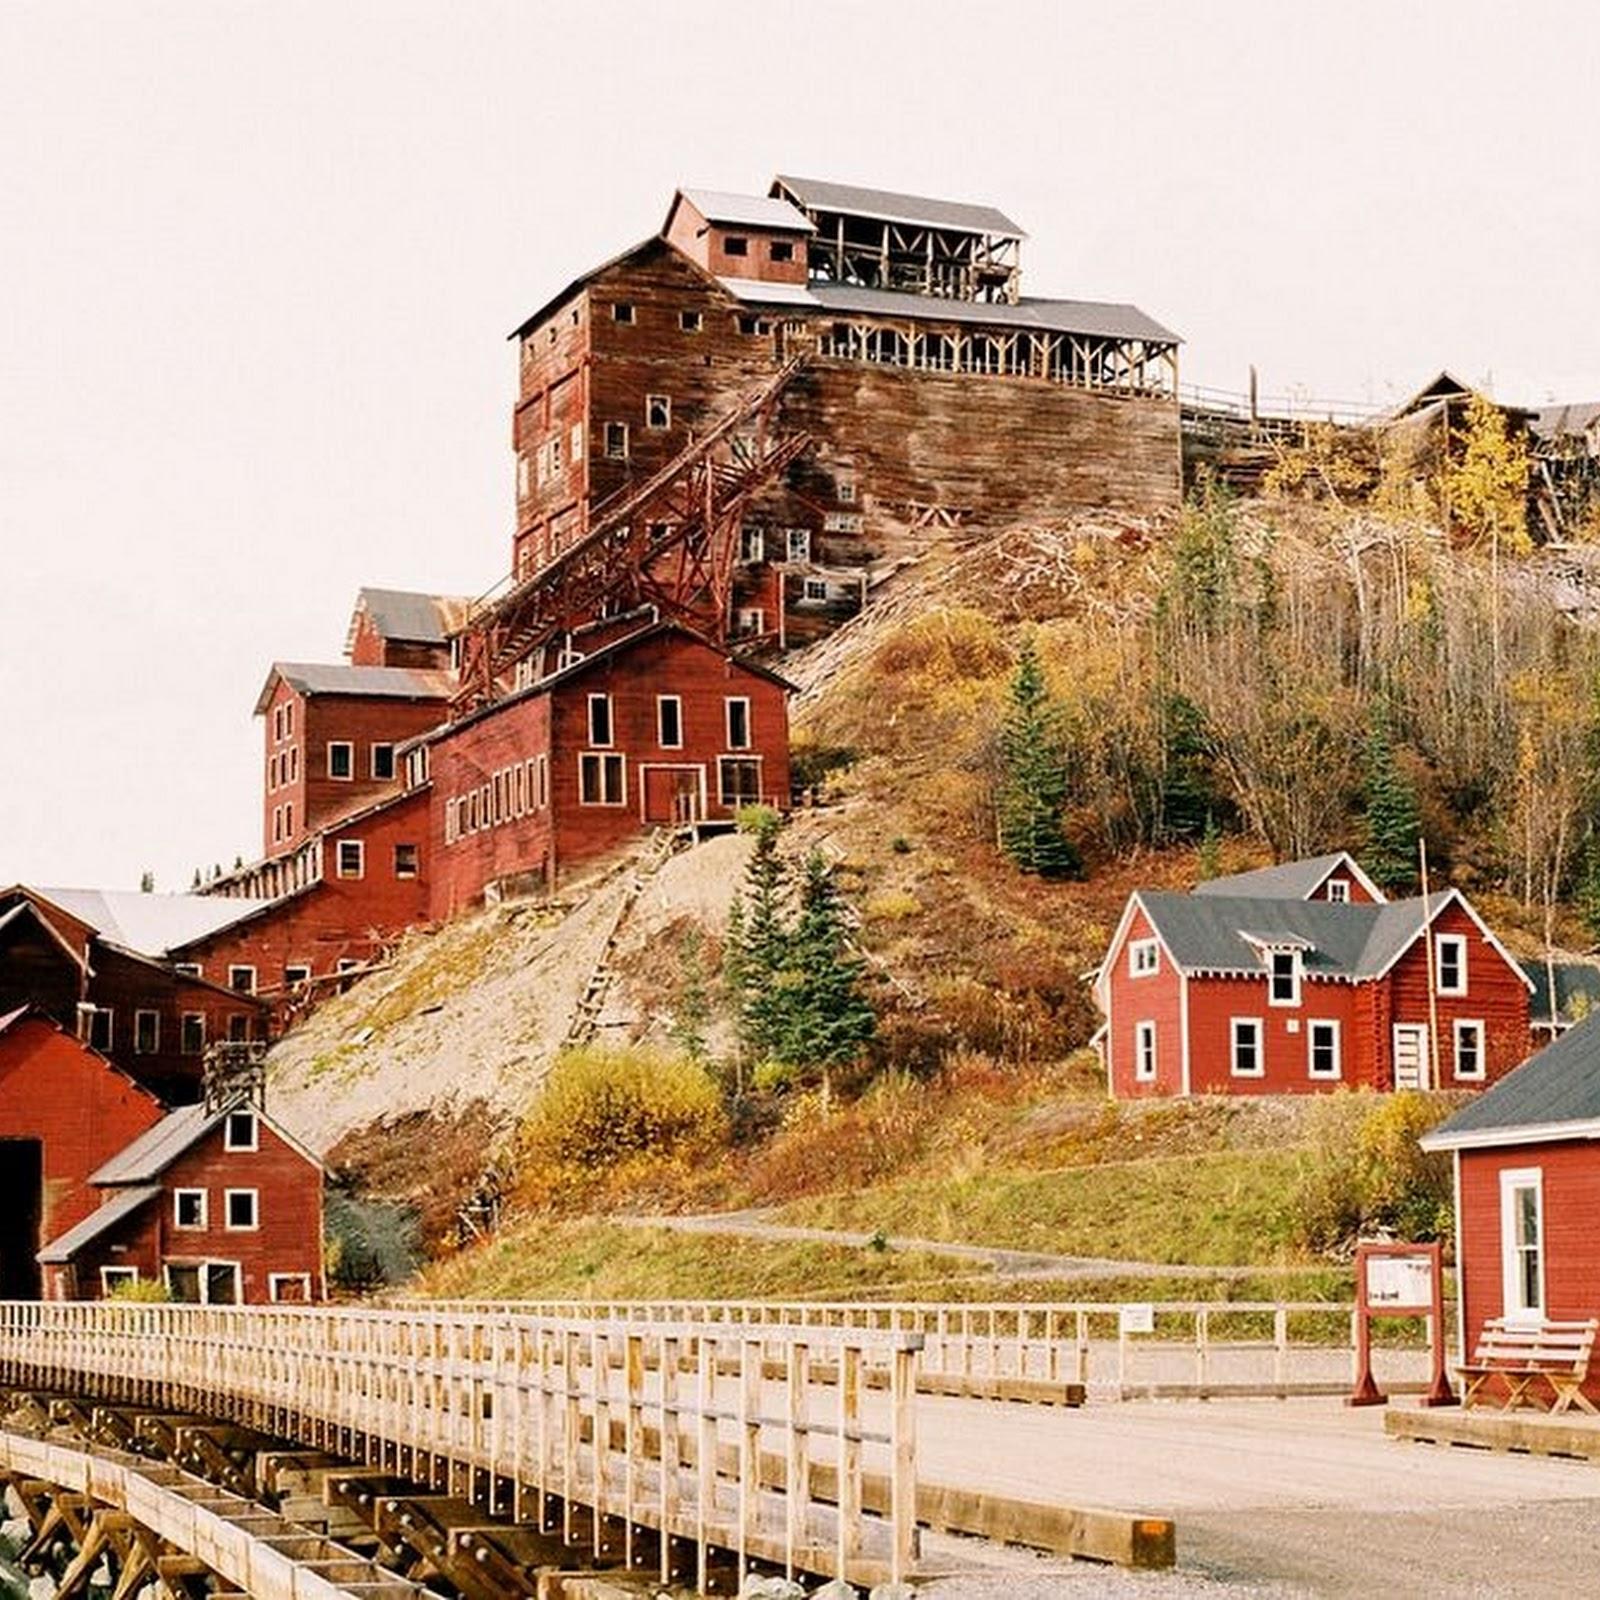 Abandoned Kennicott Copper Mining Town, Alaska